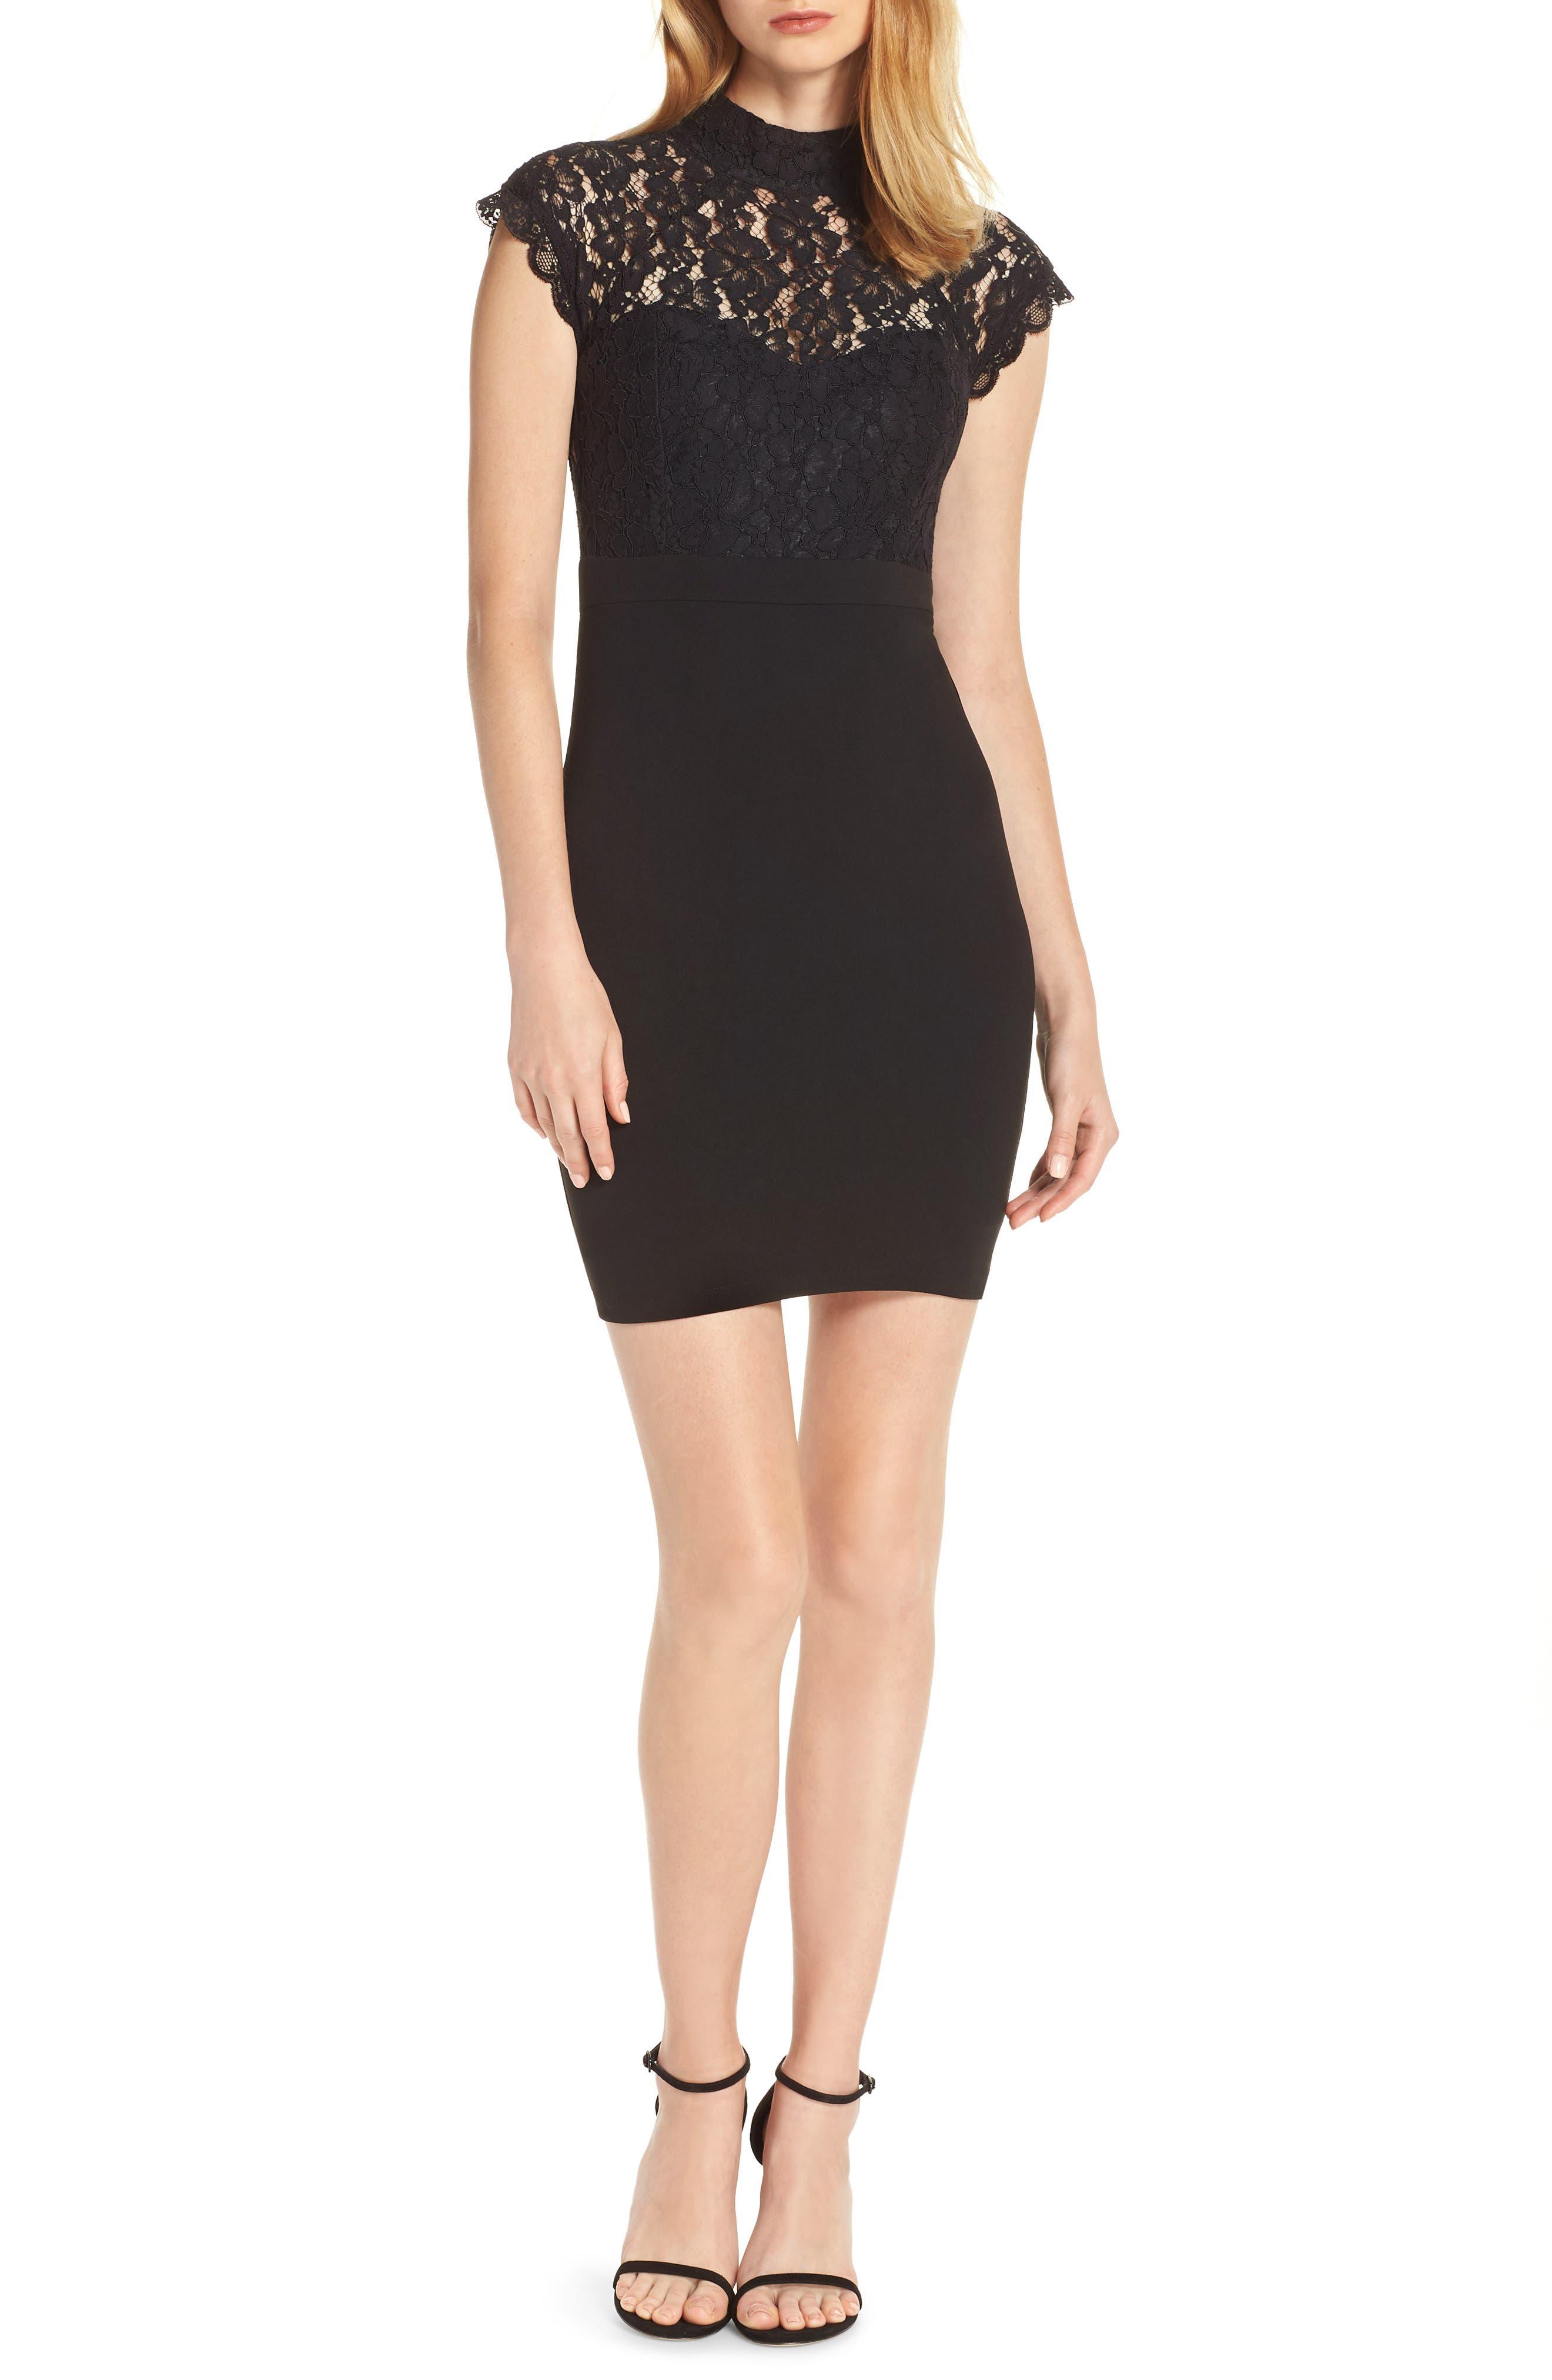 Lulus Lace Sheath Dress, Black